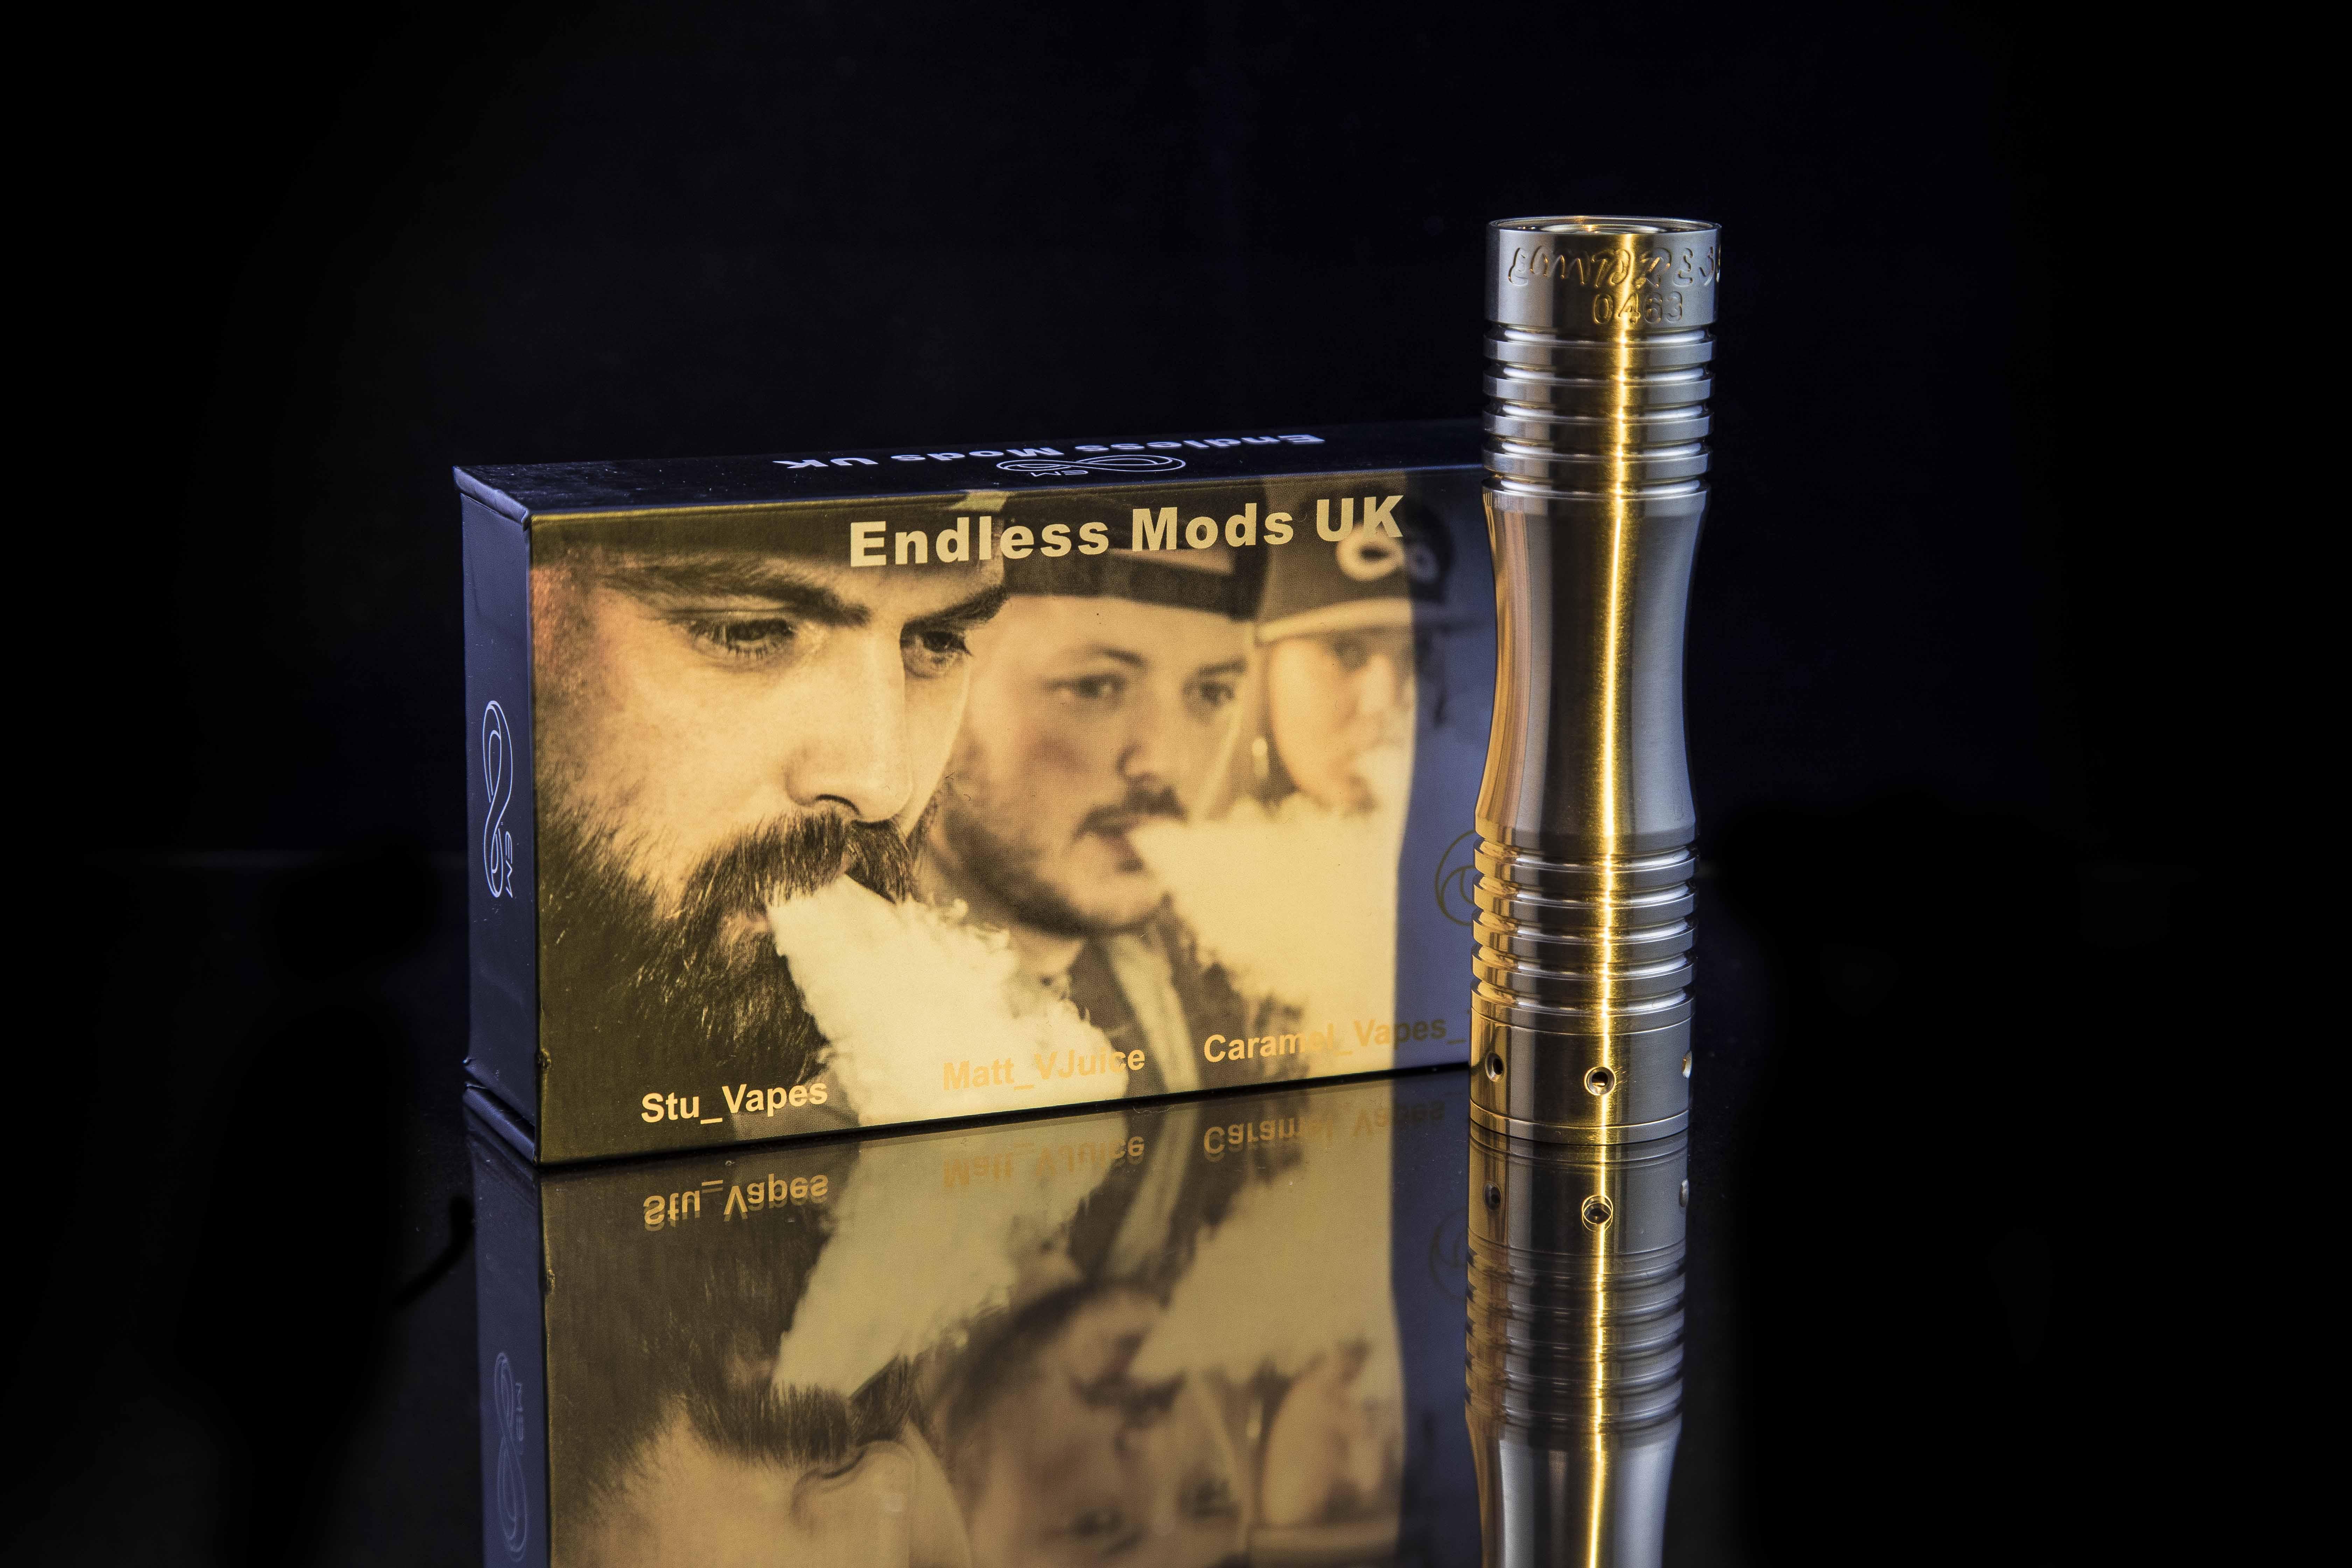 Empress Mod and RDA Set by Endless Mods UK